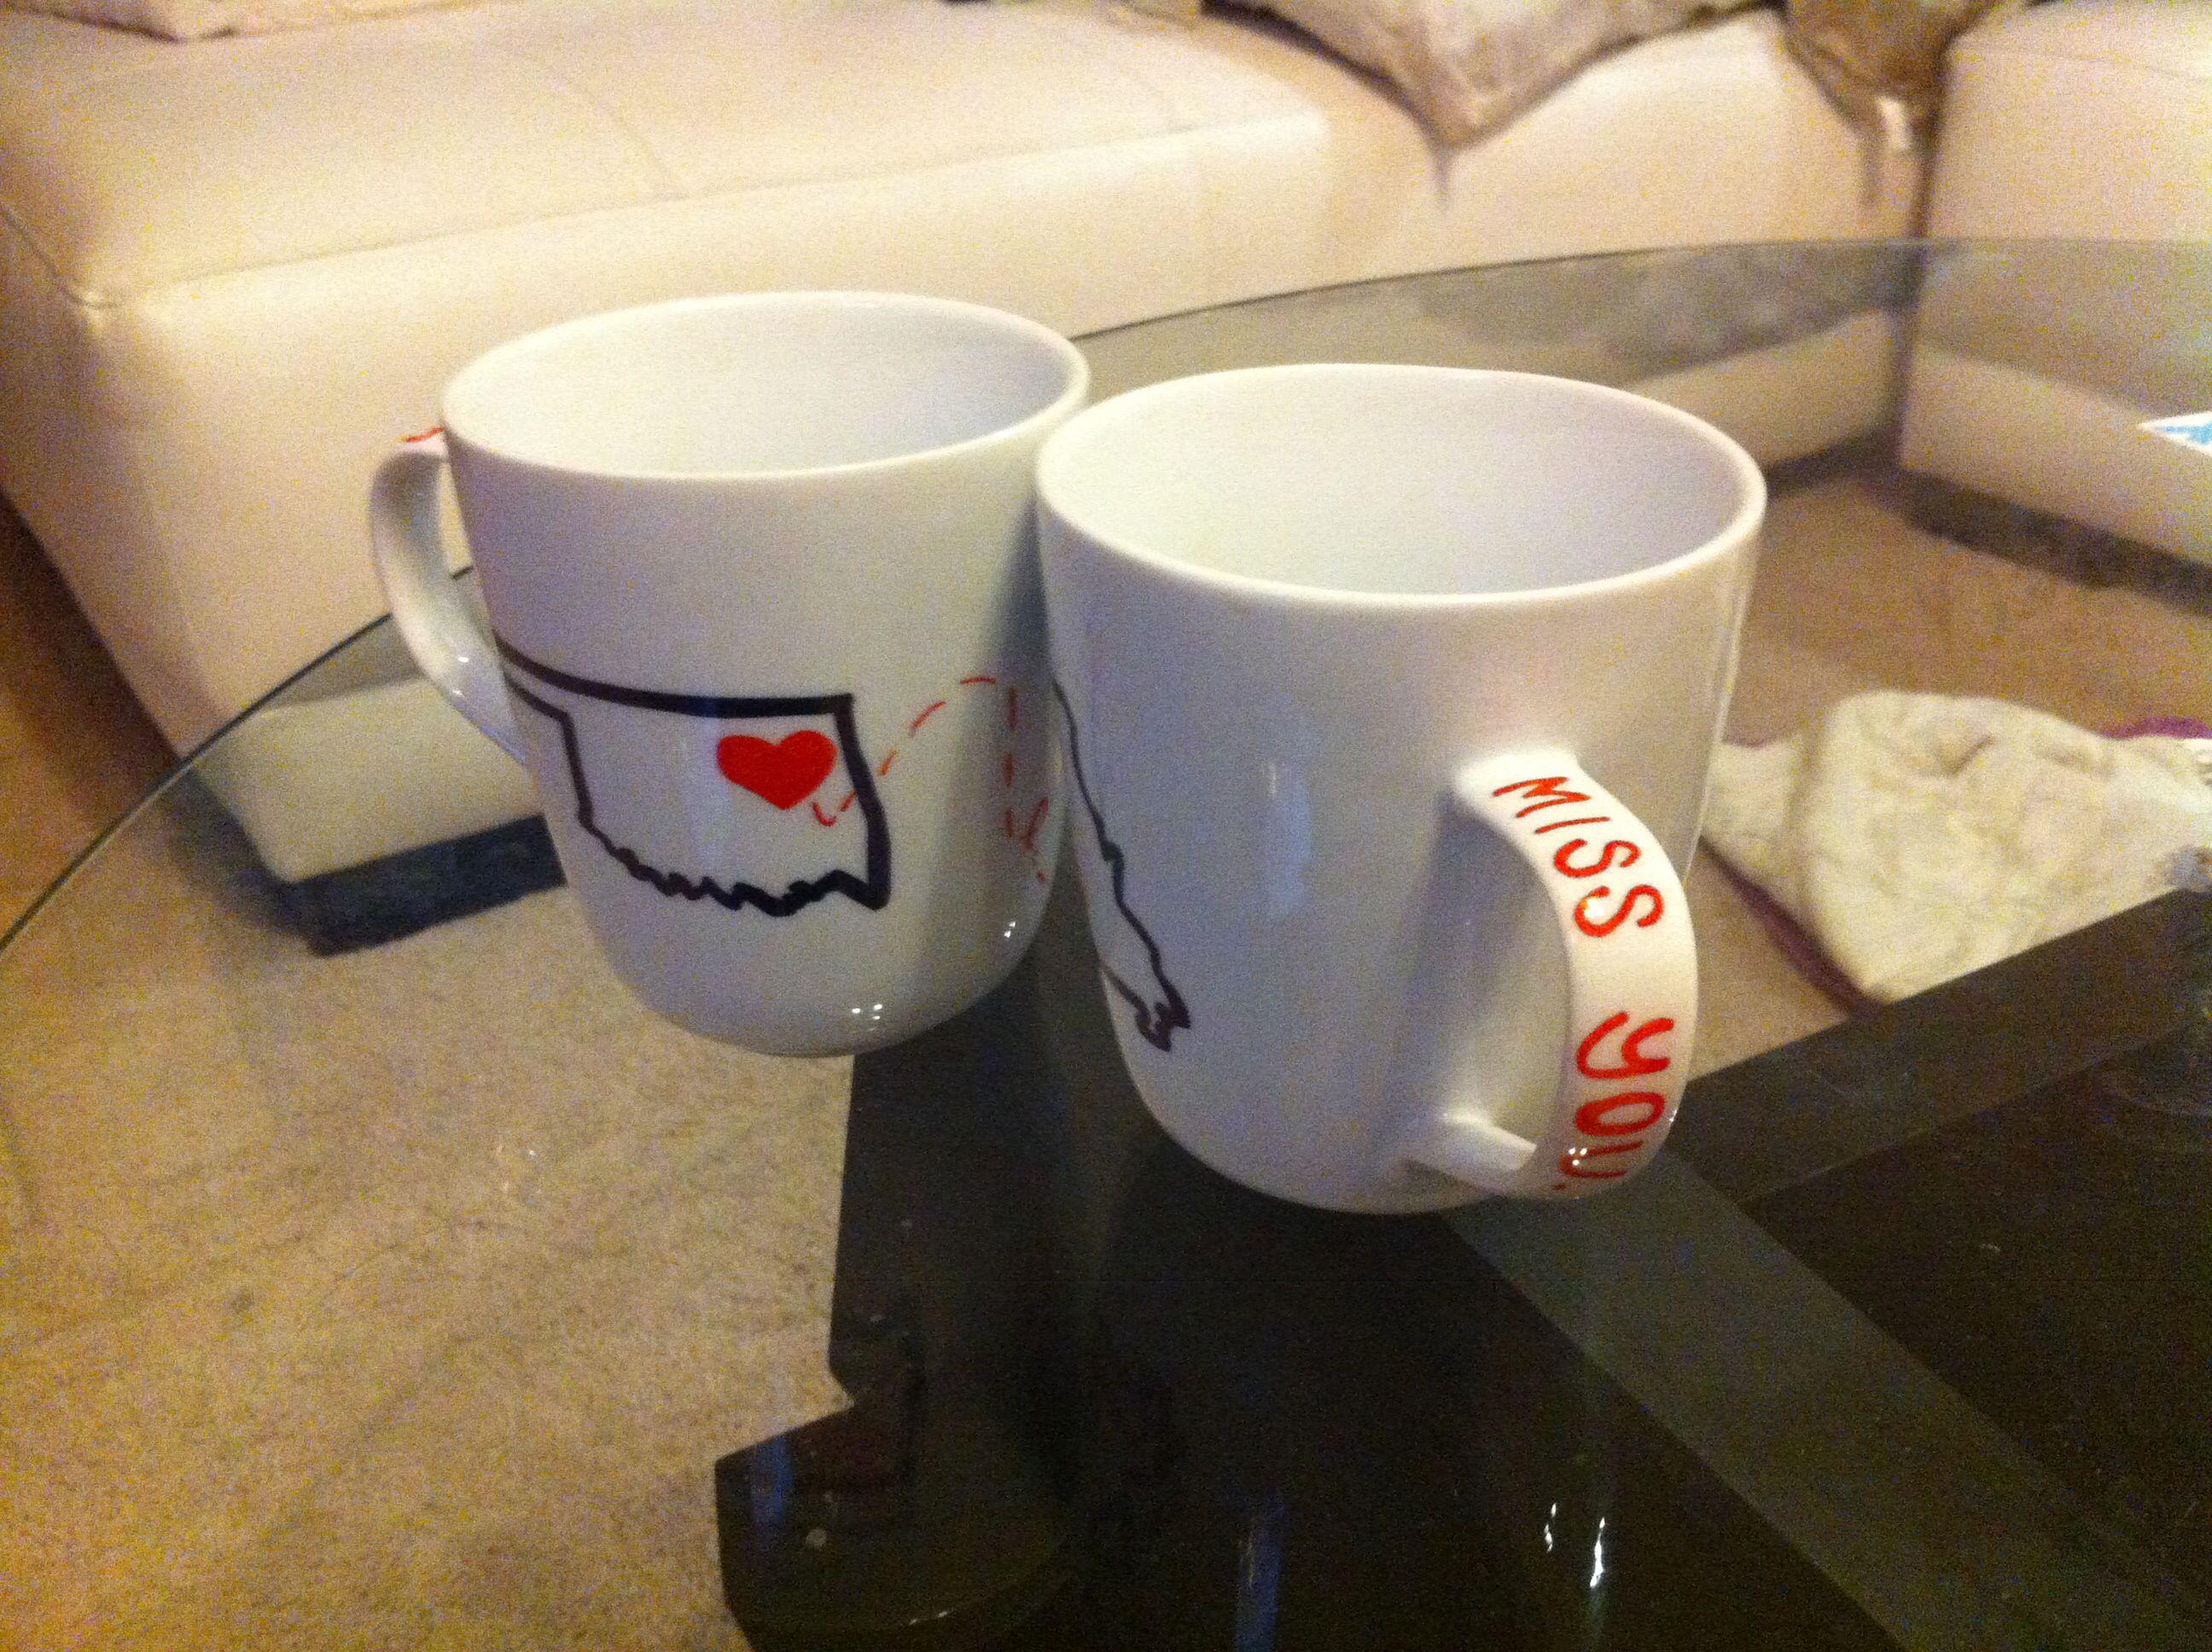 Another Mug Shot Pun Totally Intended Mug Shots Glassware